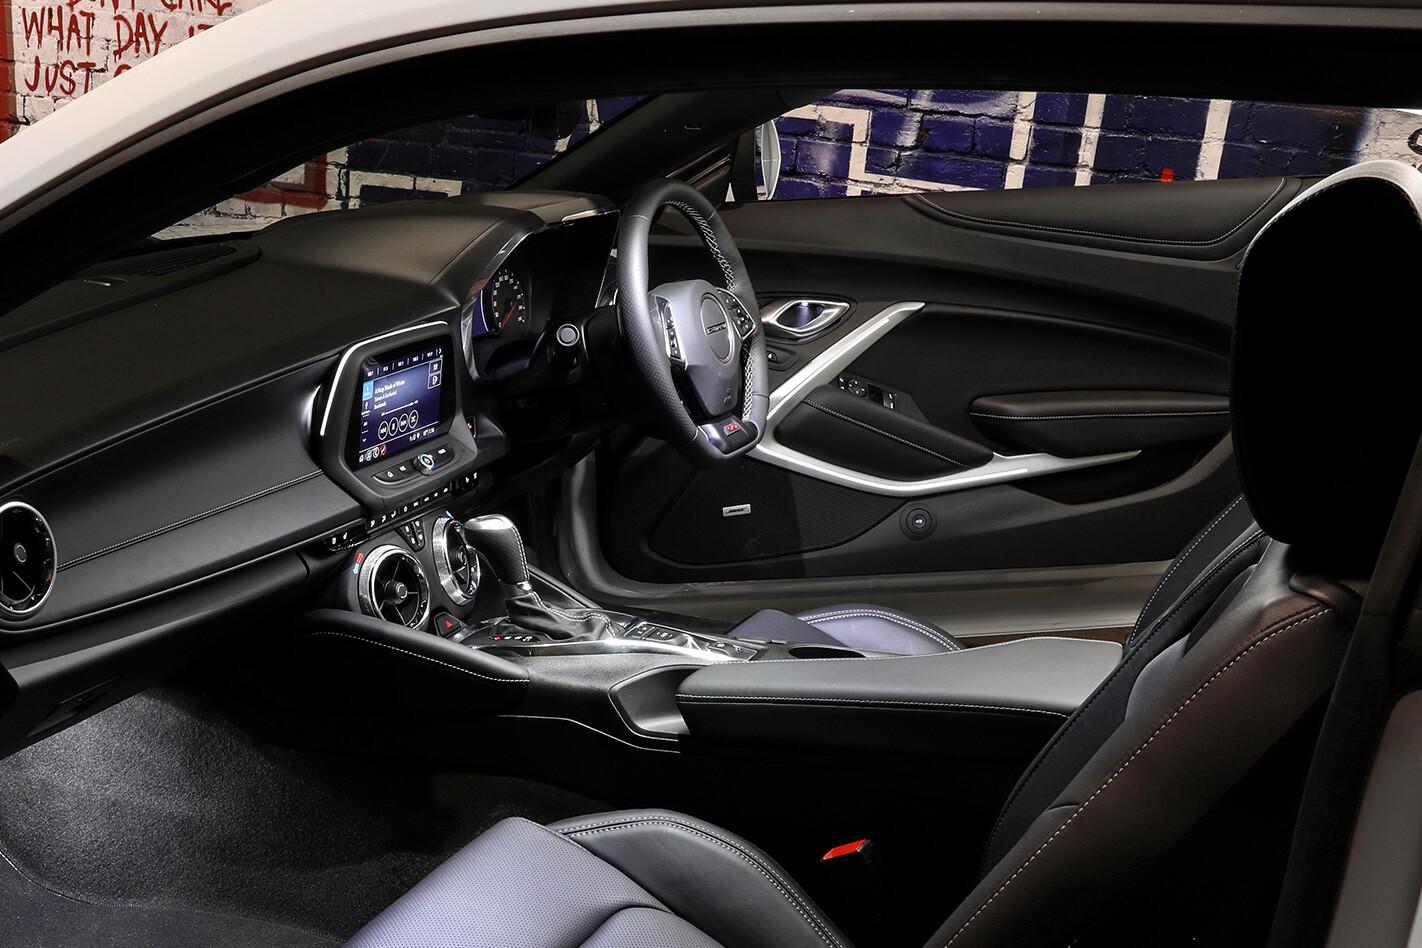 New V Used Camaro 90 Jpg